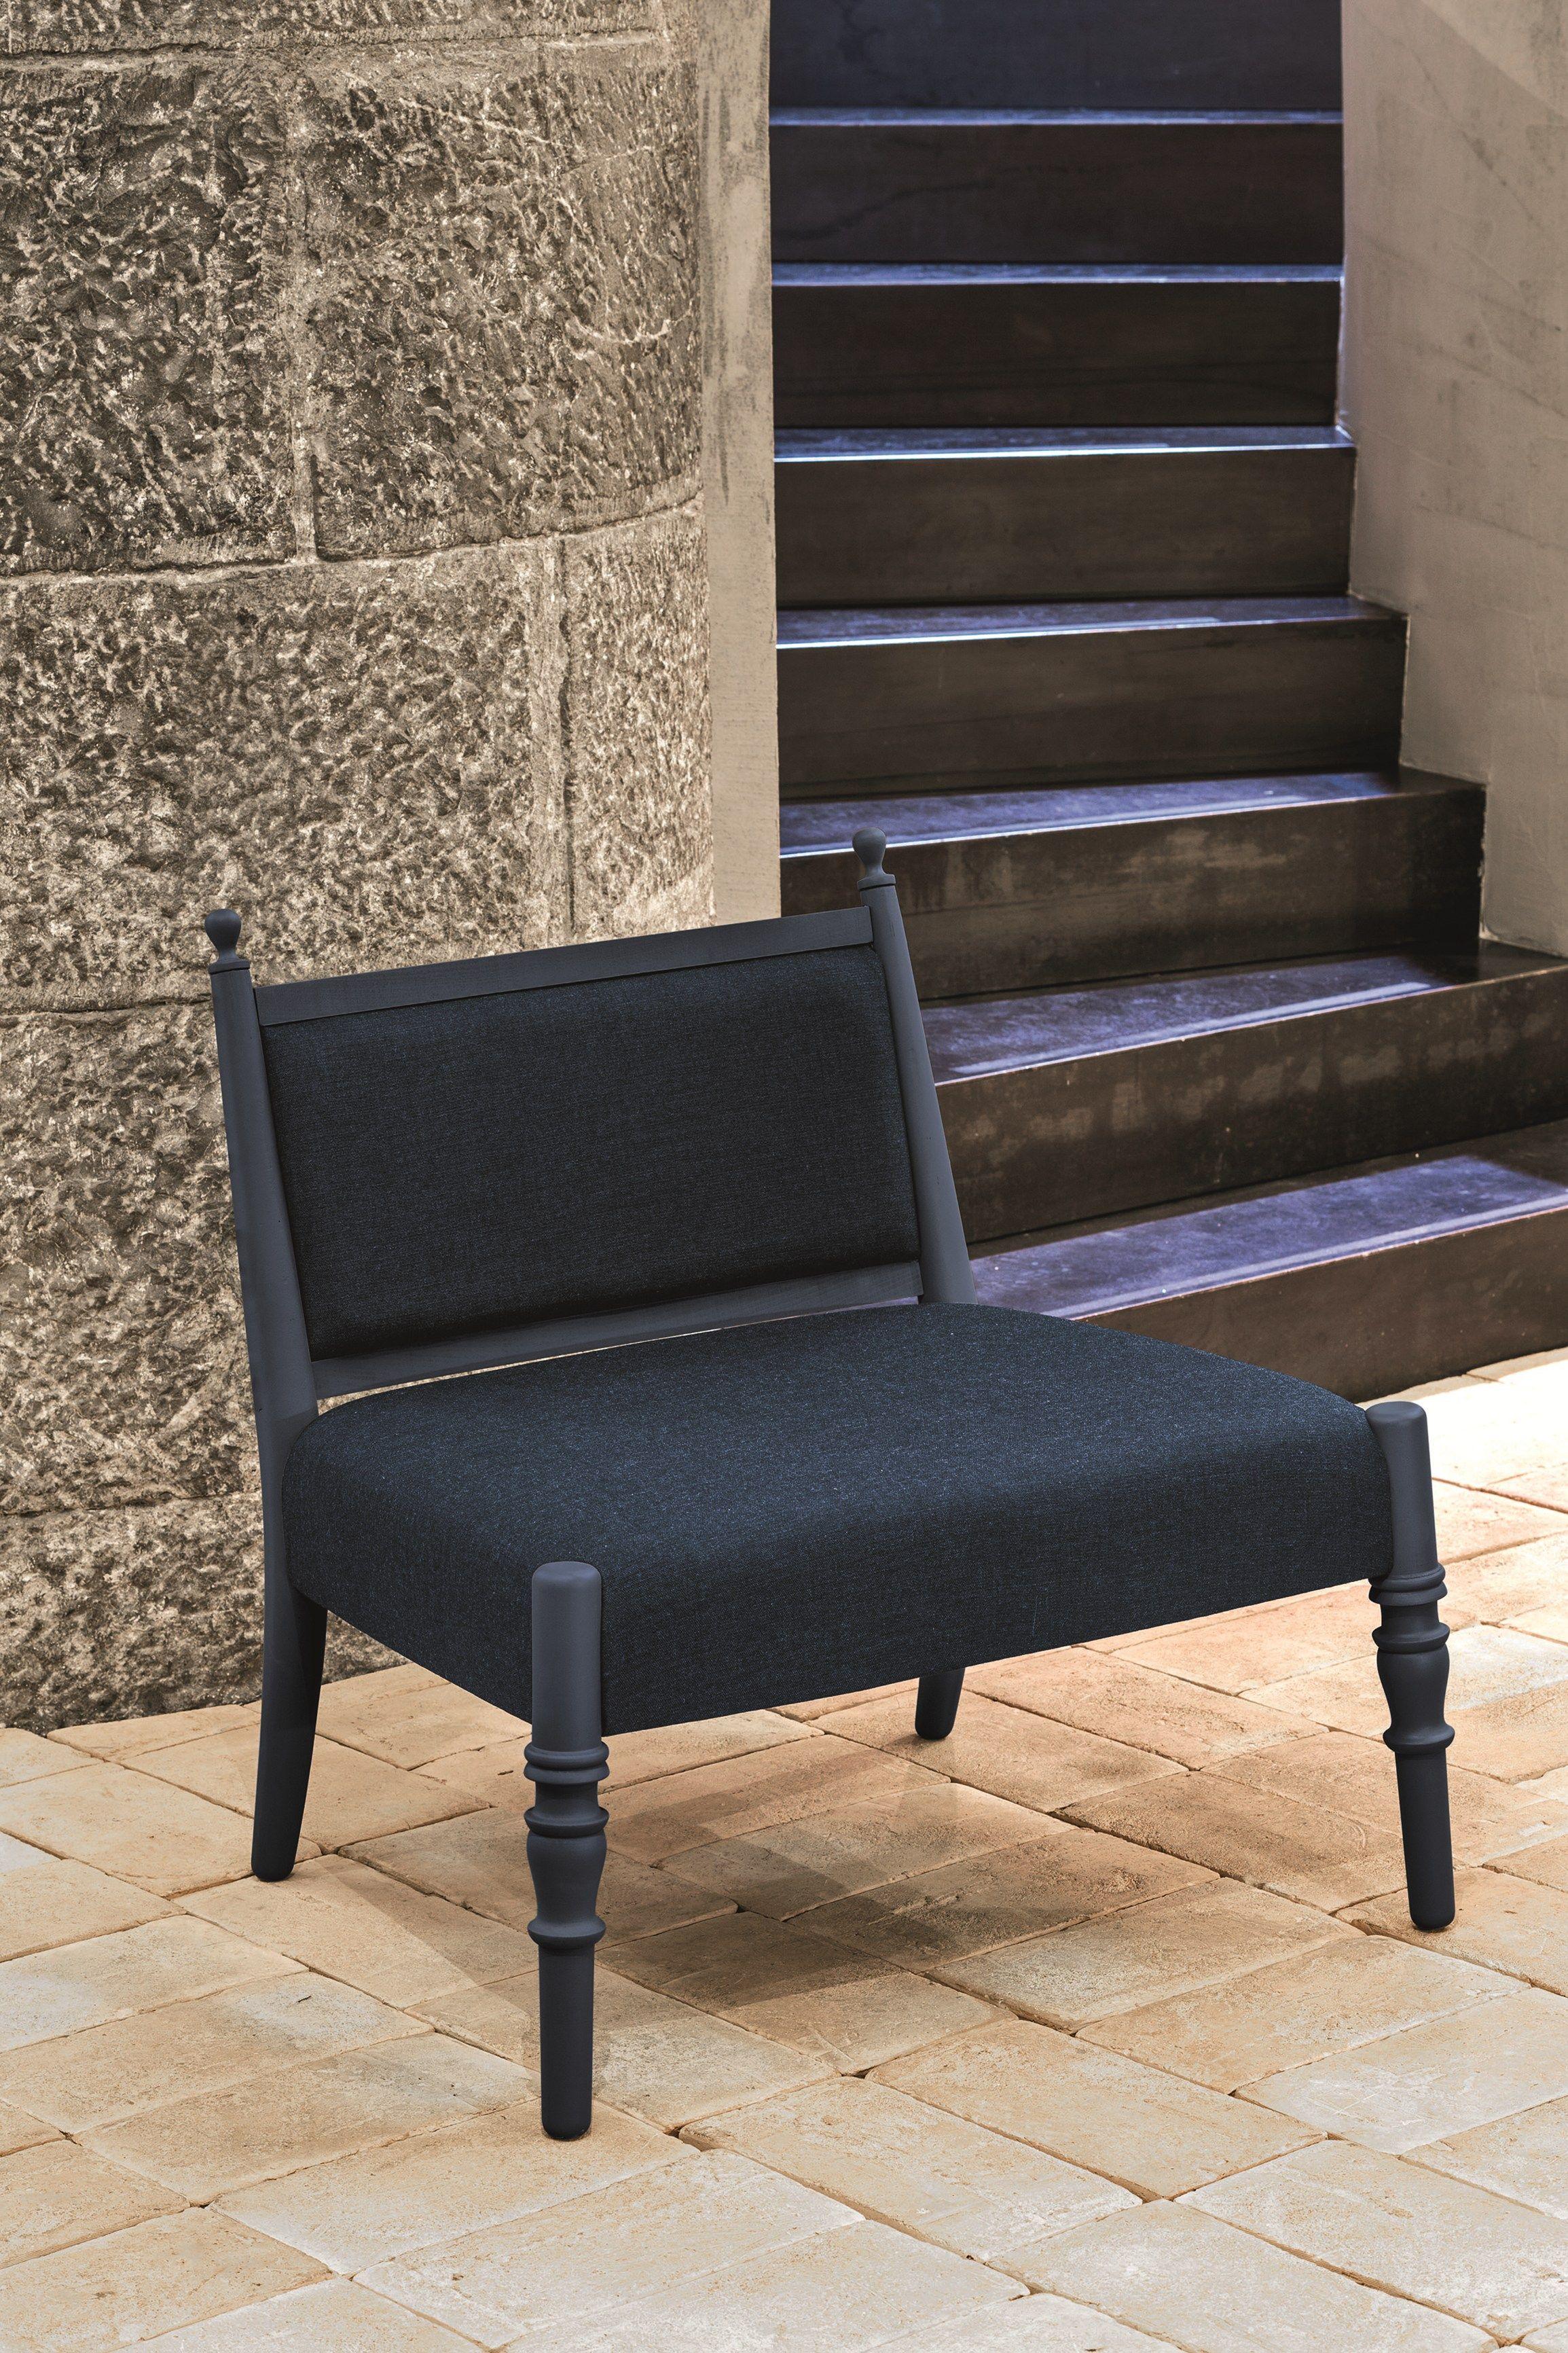 Petit fauteuil en hêtre CENTURY 7 Collection Century by Very Wood | design Marcel Wanders